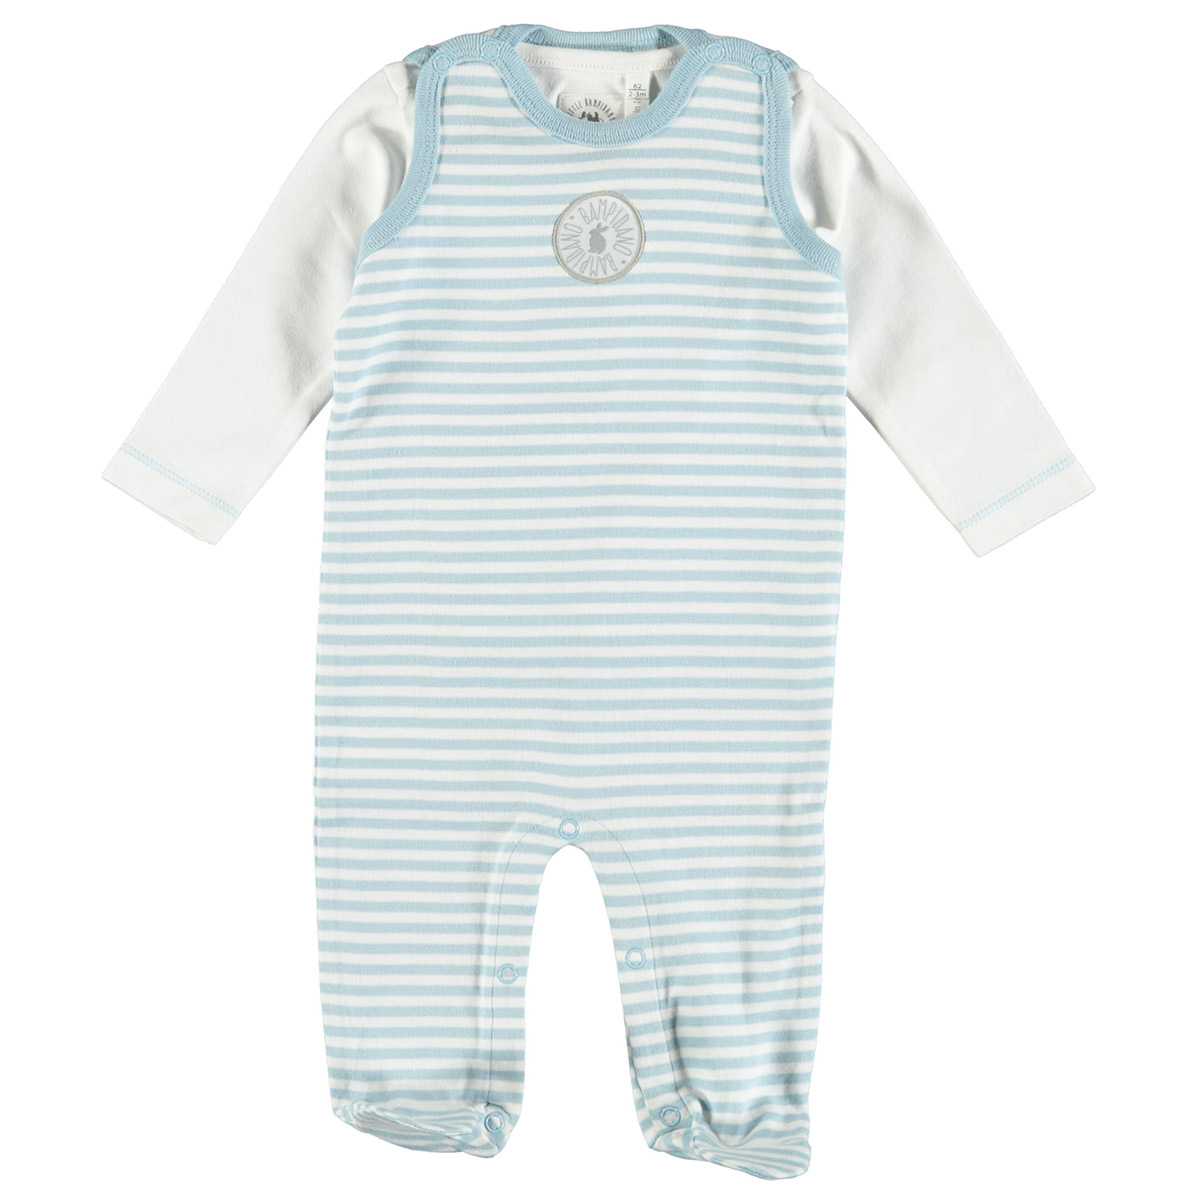 1fea08496fa2ac Babykleding online bestellen